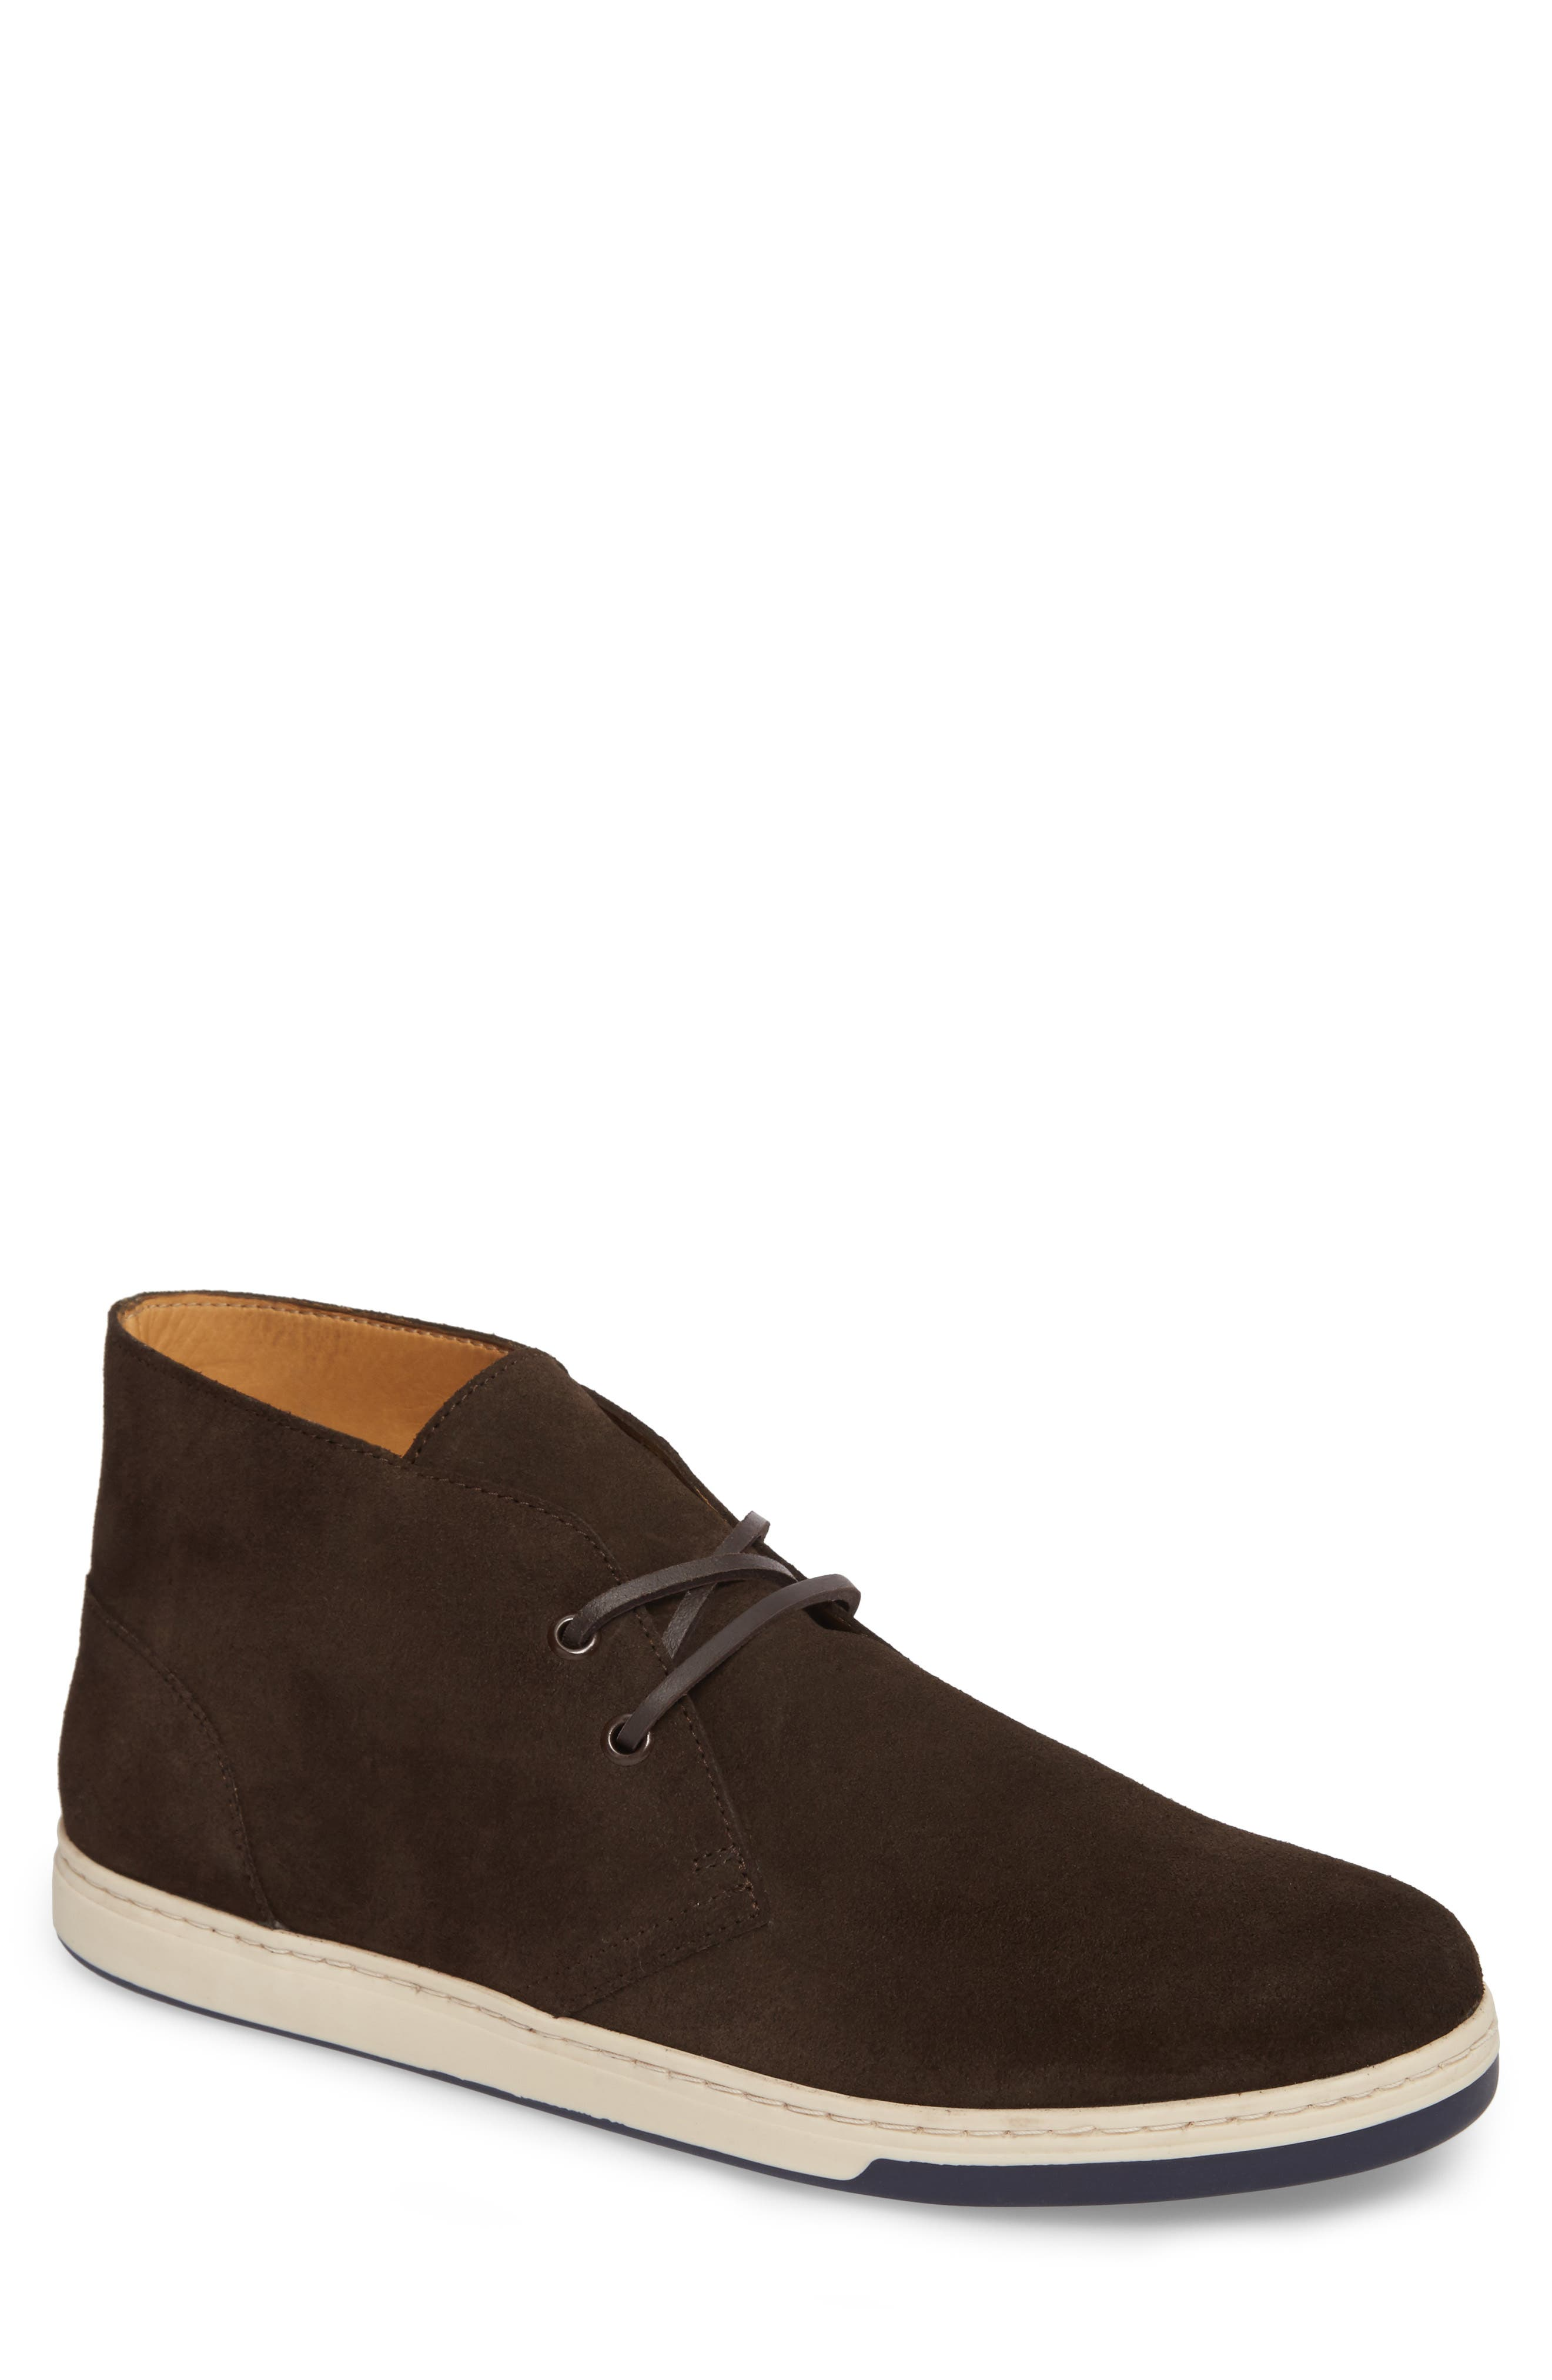 Berkleys Sneaker,                         Main,                         color,